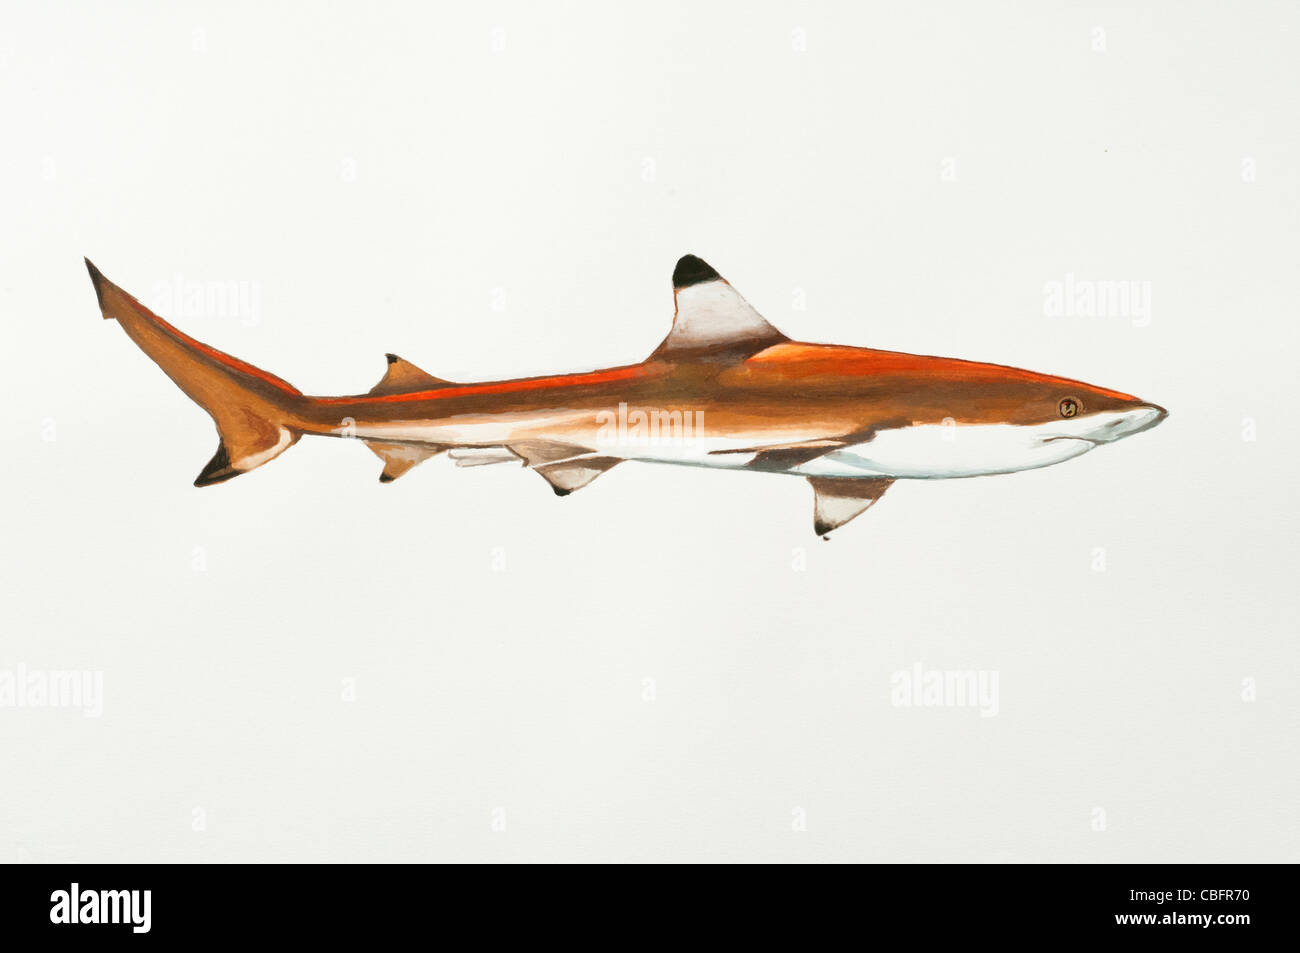 Blacktip reef shark Carcharhinus melanopterus Carcharhinidae Stock Photo